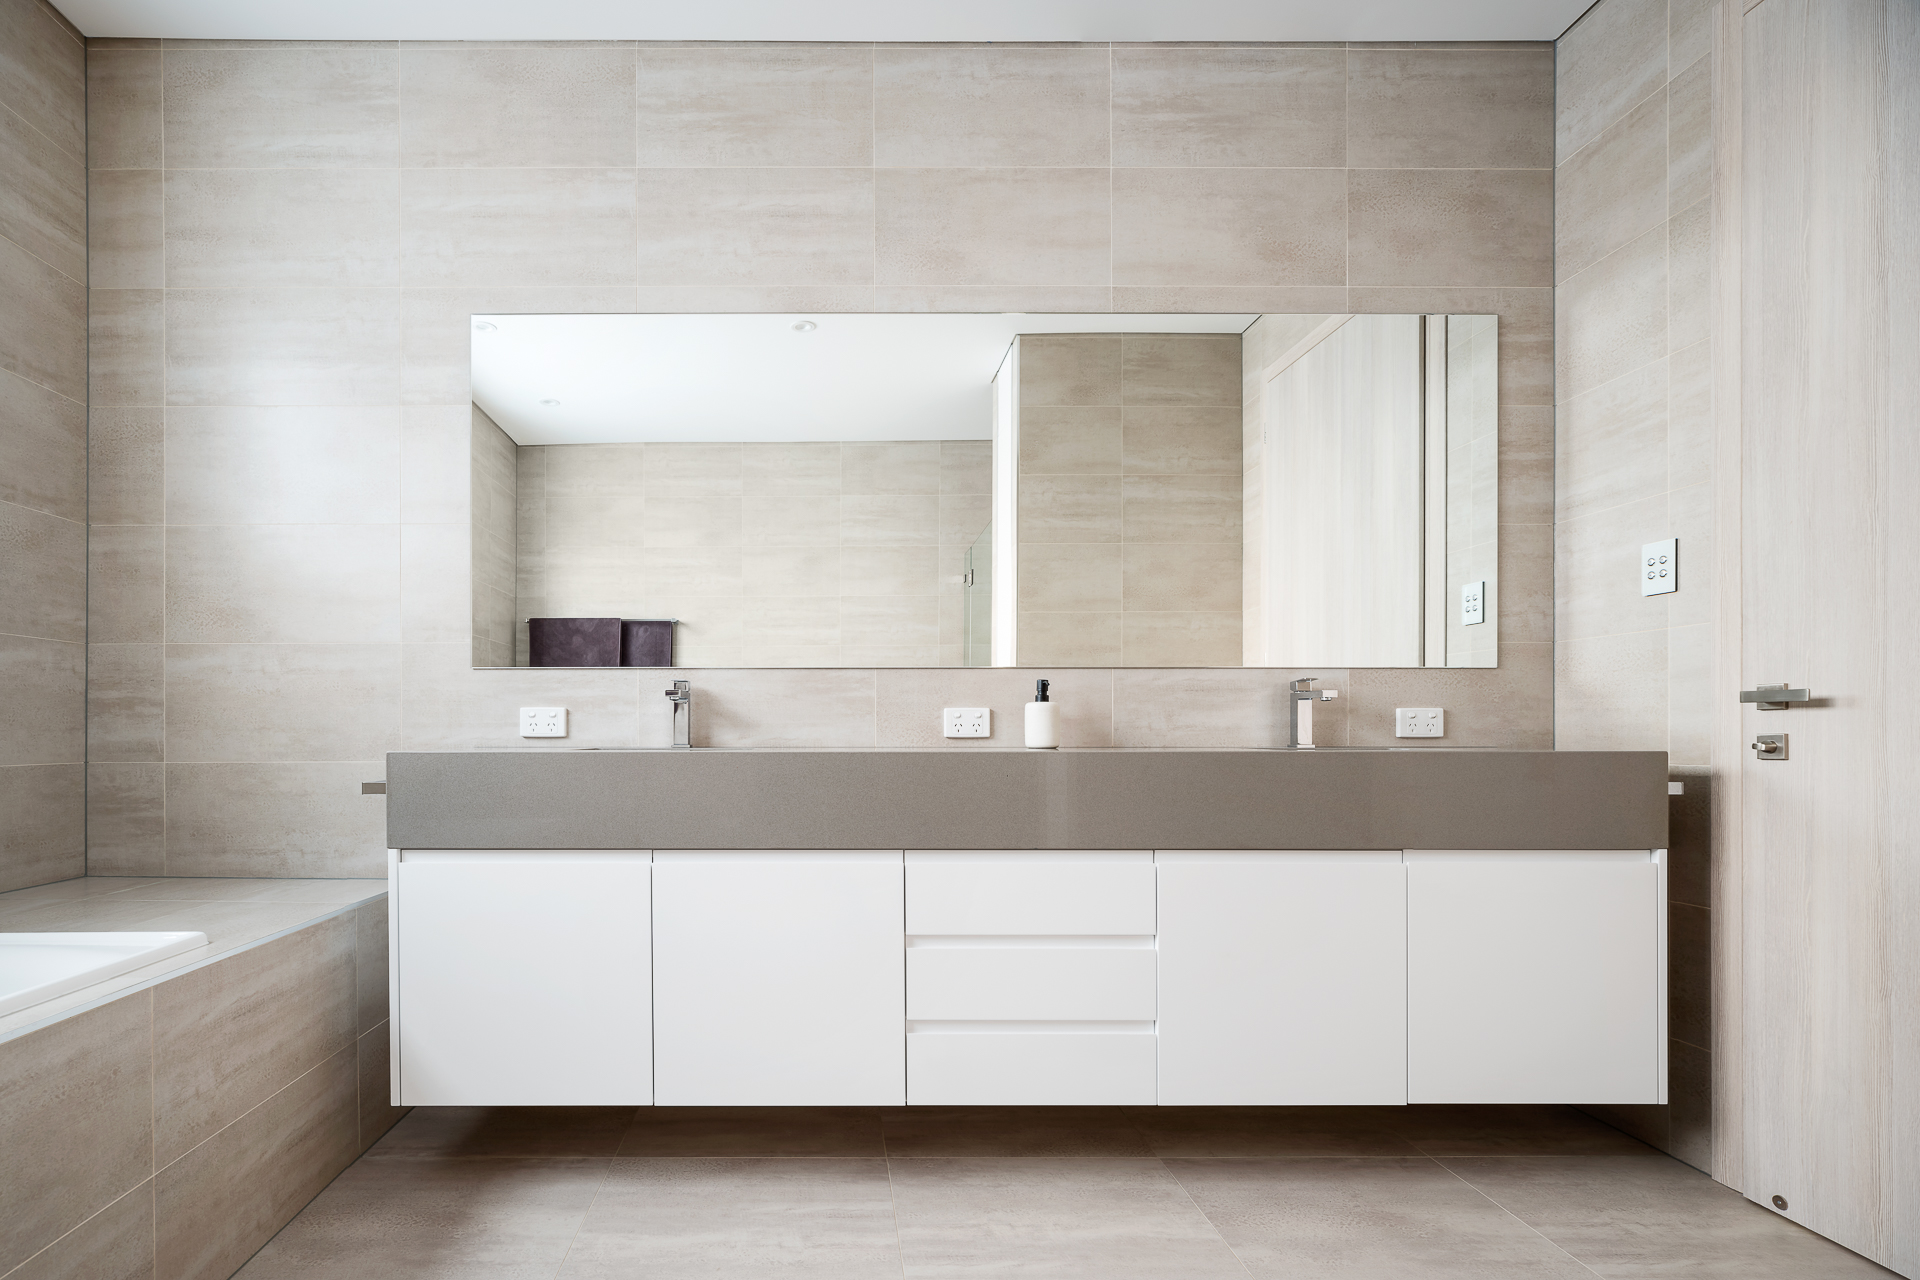 Balnei & Colina - Inspiration for your next renovation project ...